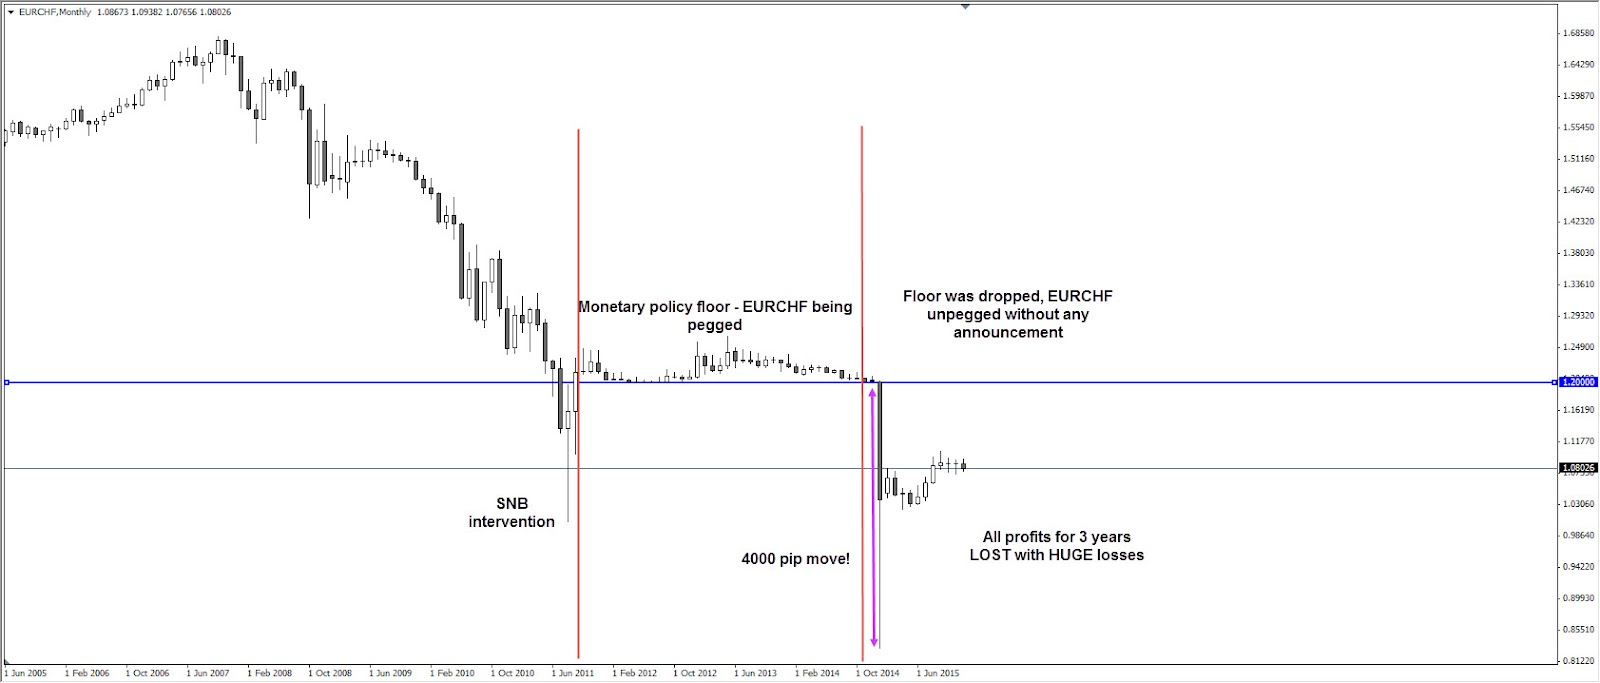 Vox day trading strategies